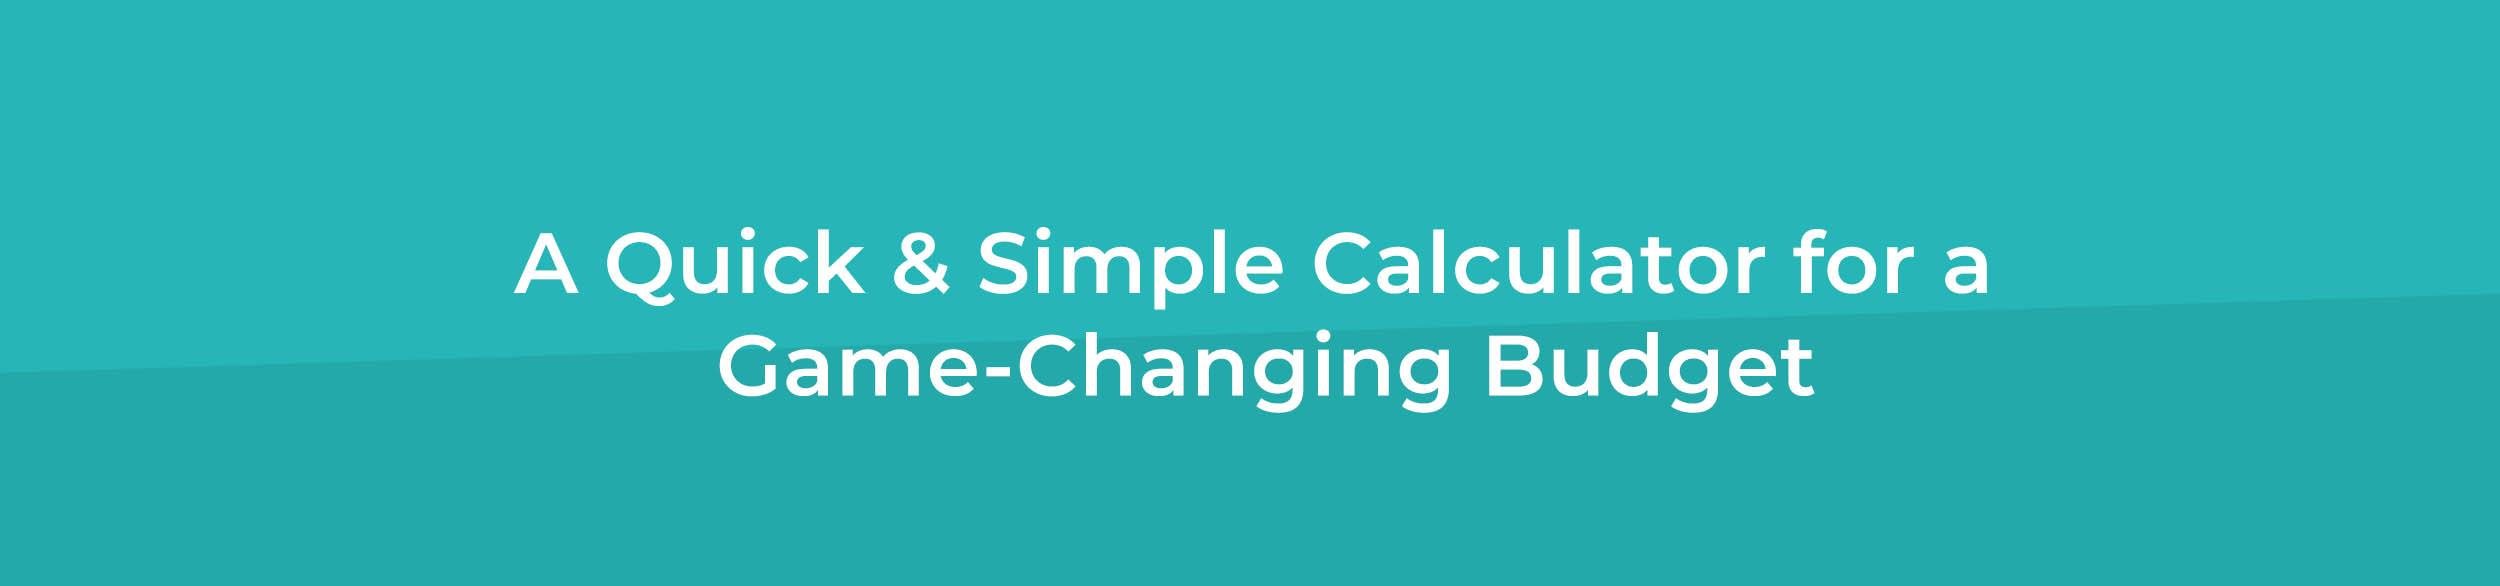 budget-calculator-banner.jpg